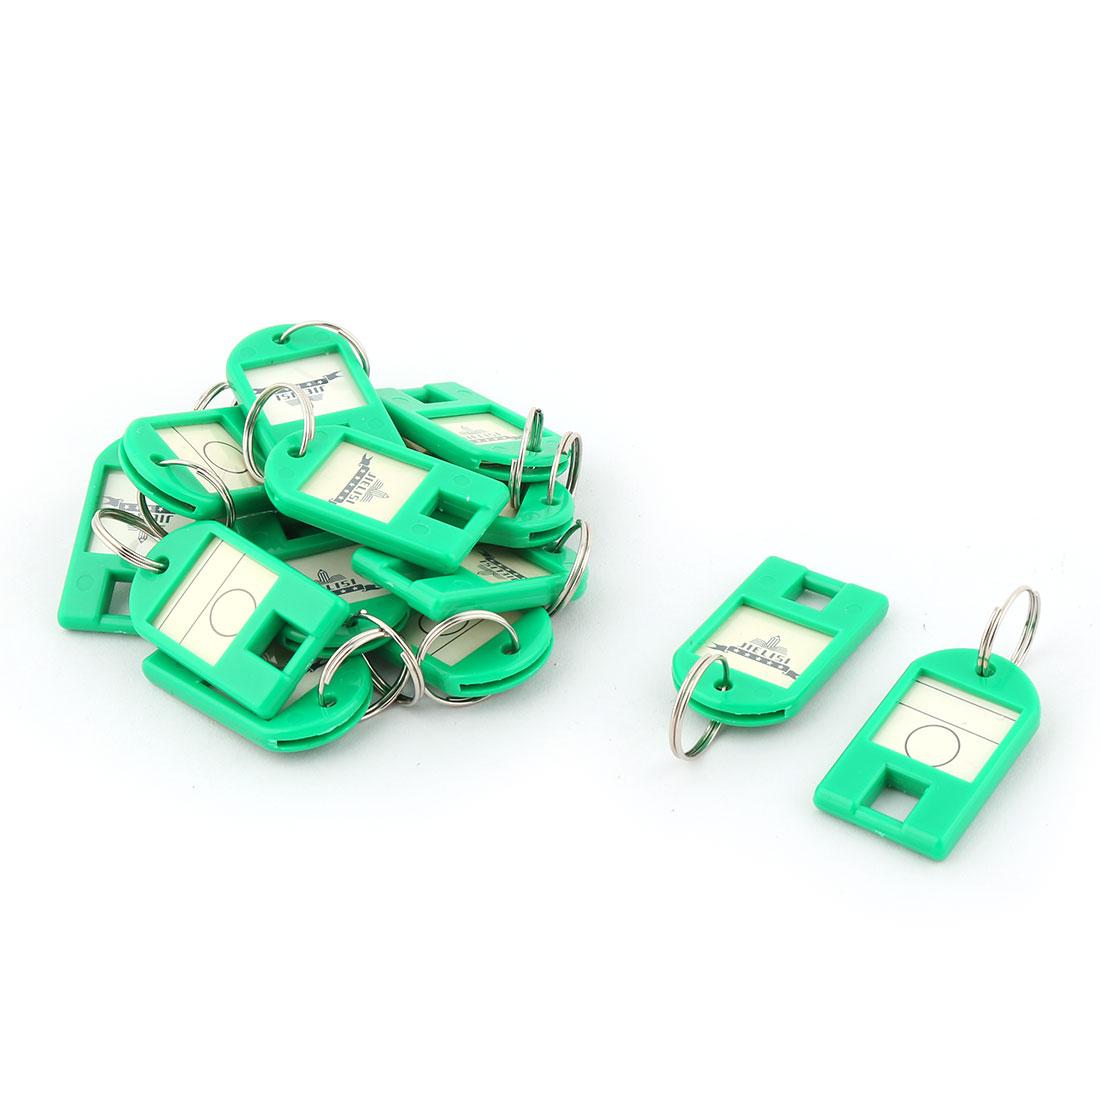 Metal Ring ID Label Name Tag Key Fobs Luggage Bag Marking Keyring Keychain Green 15pcs